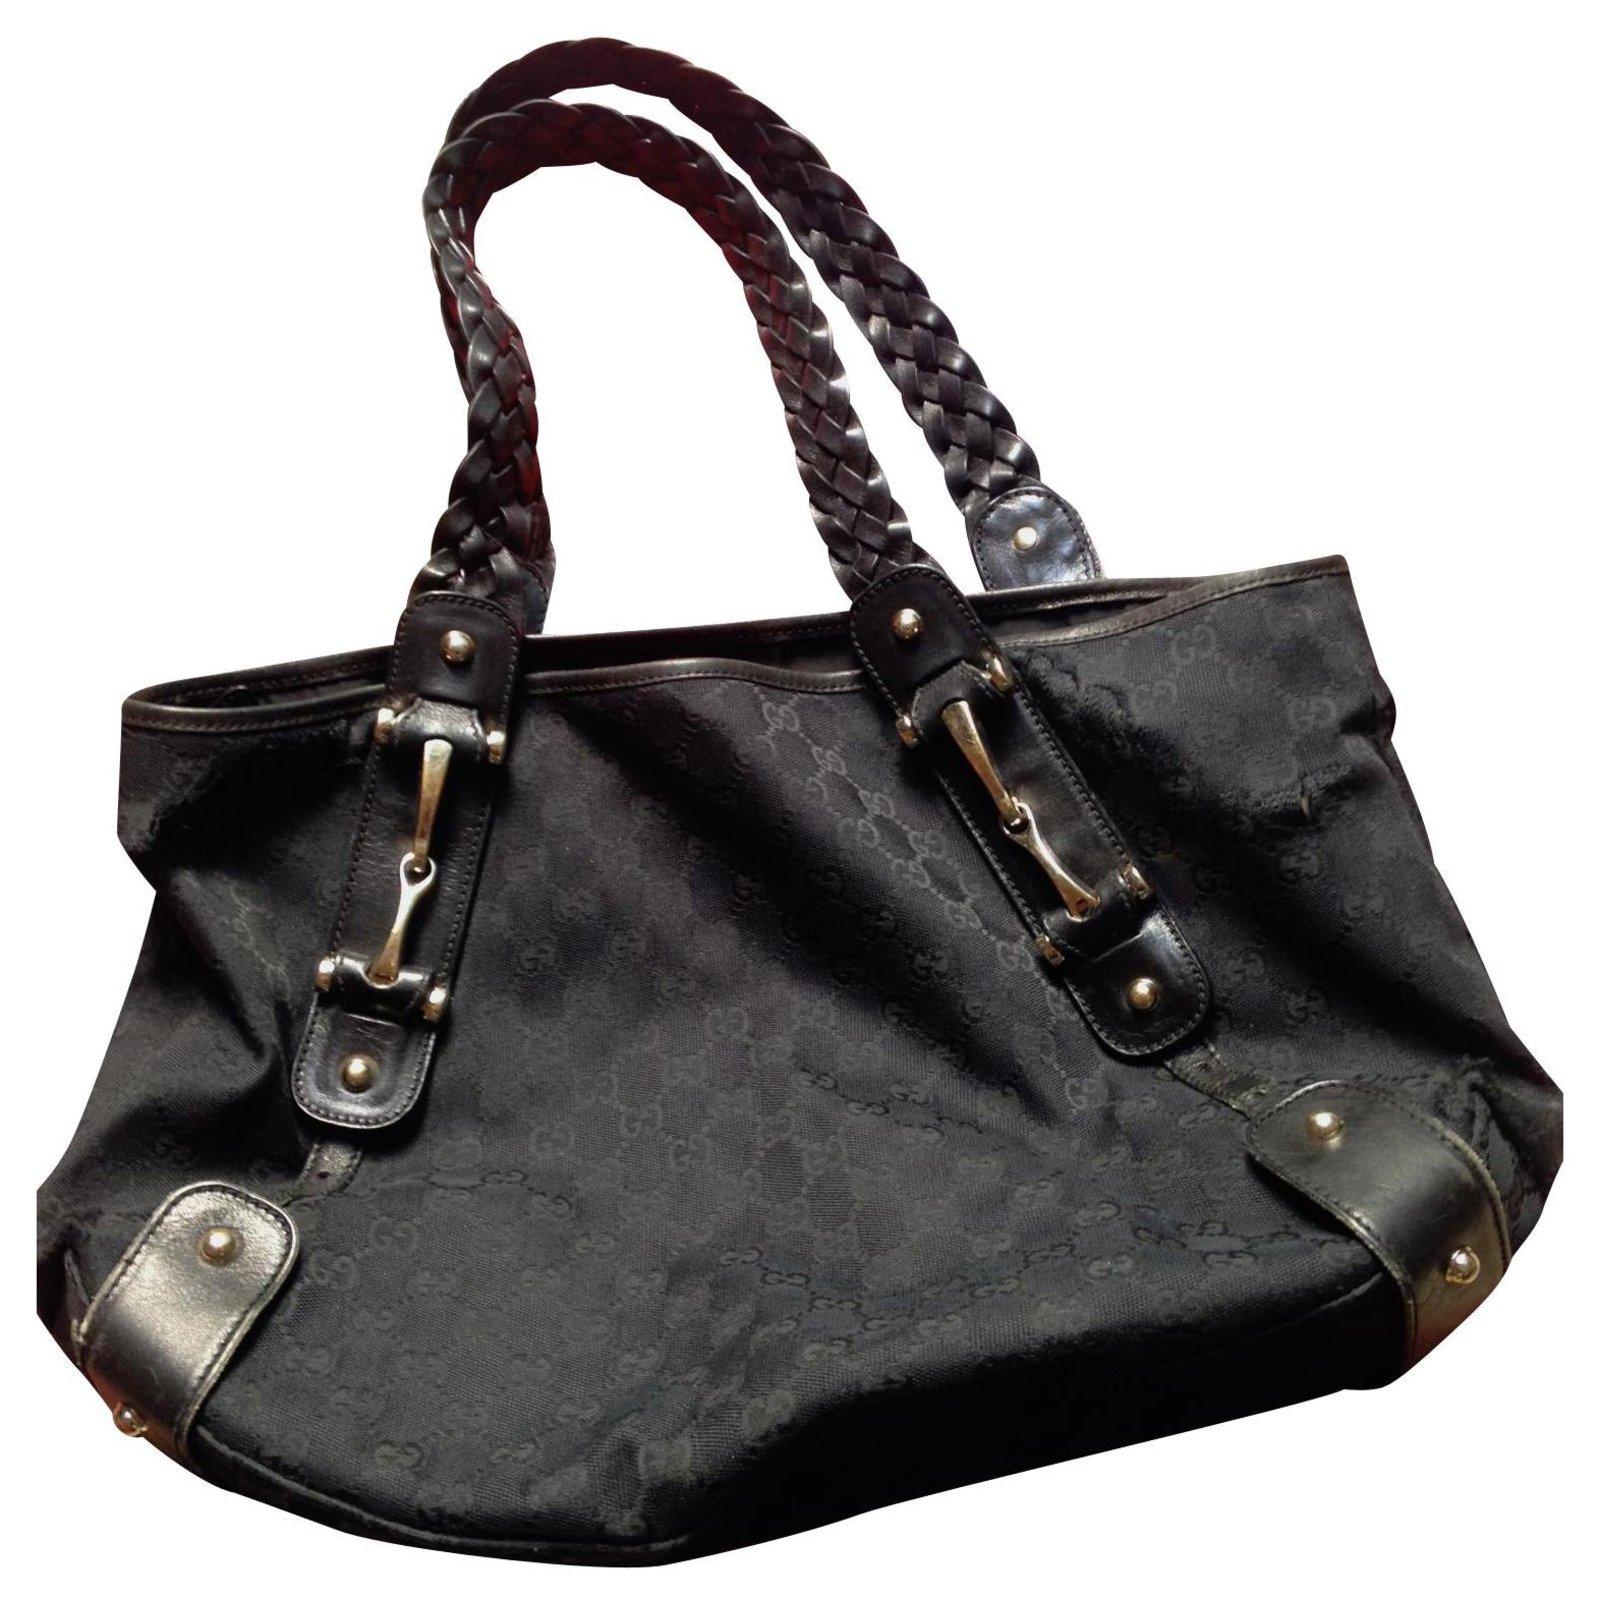 Gucci Hobo Handbags Cloth Black